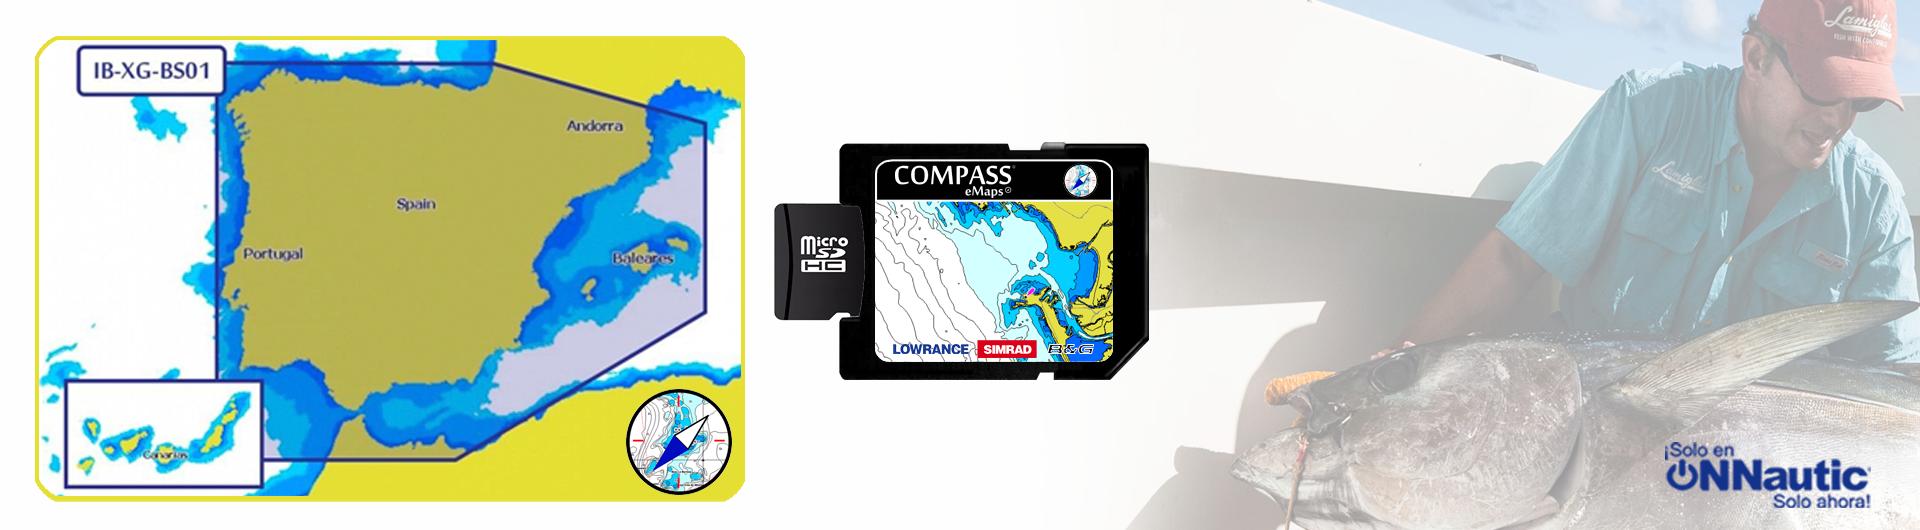 Compass Basic